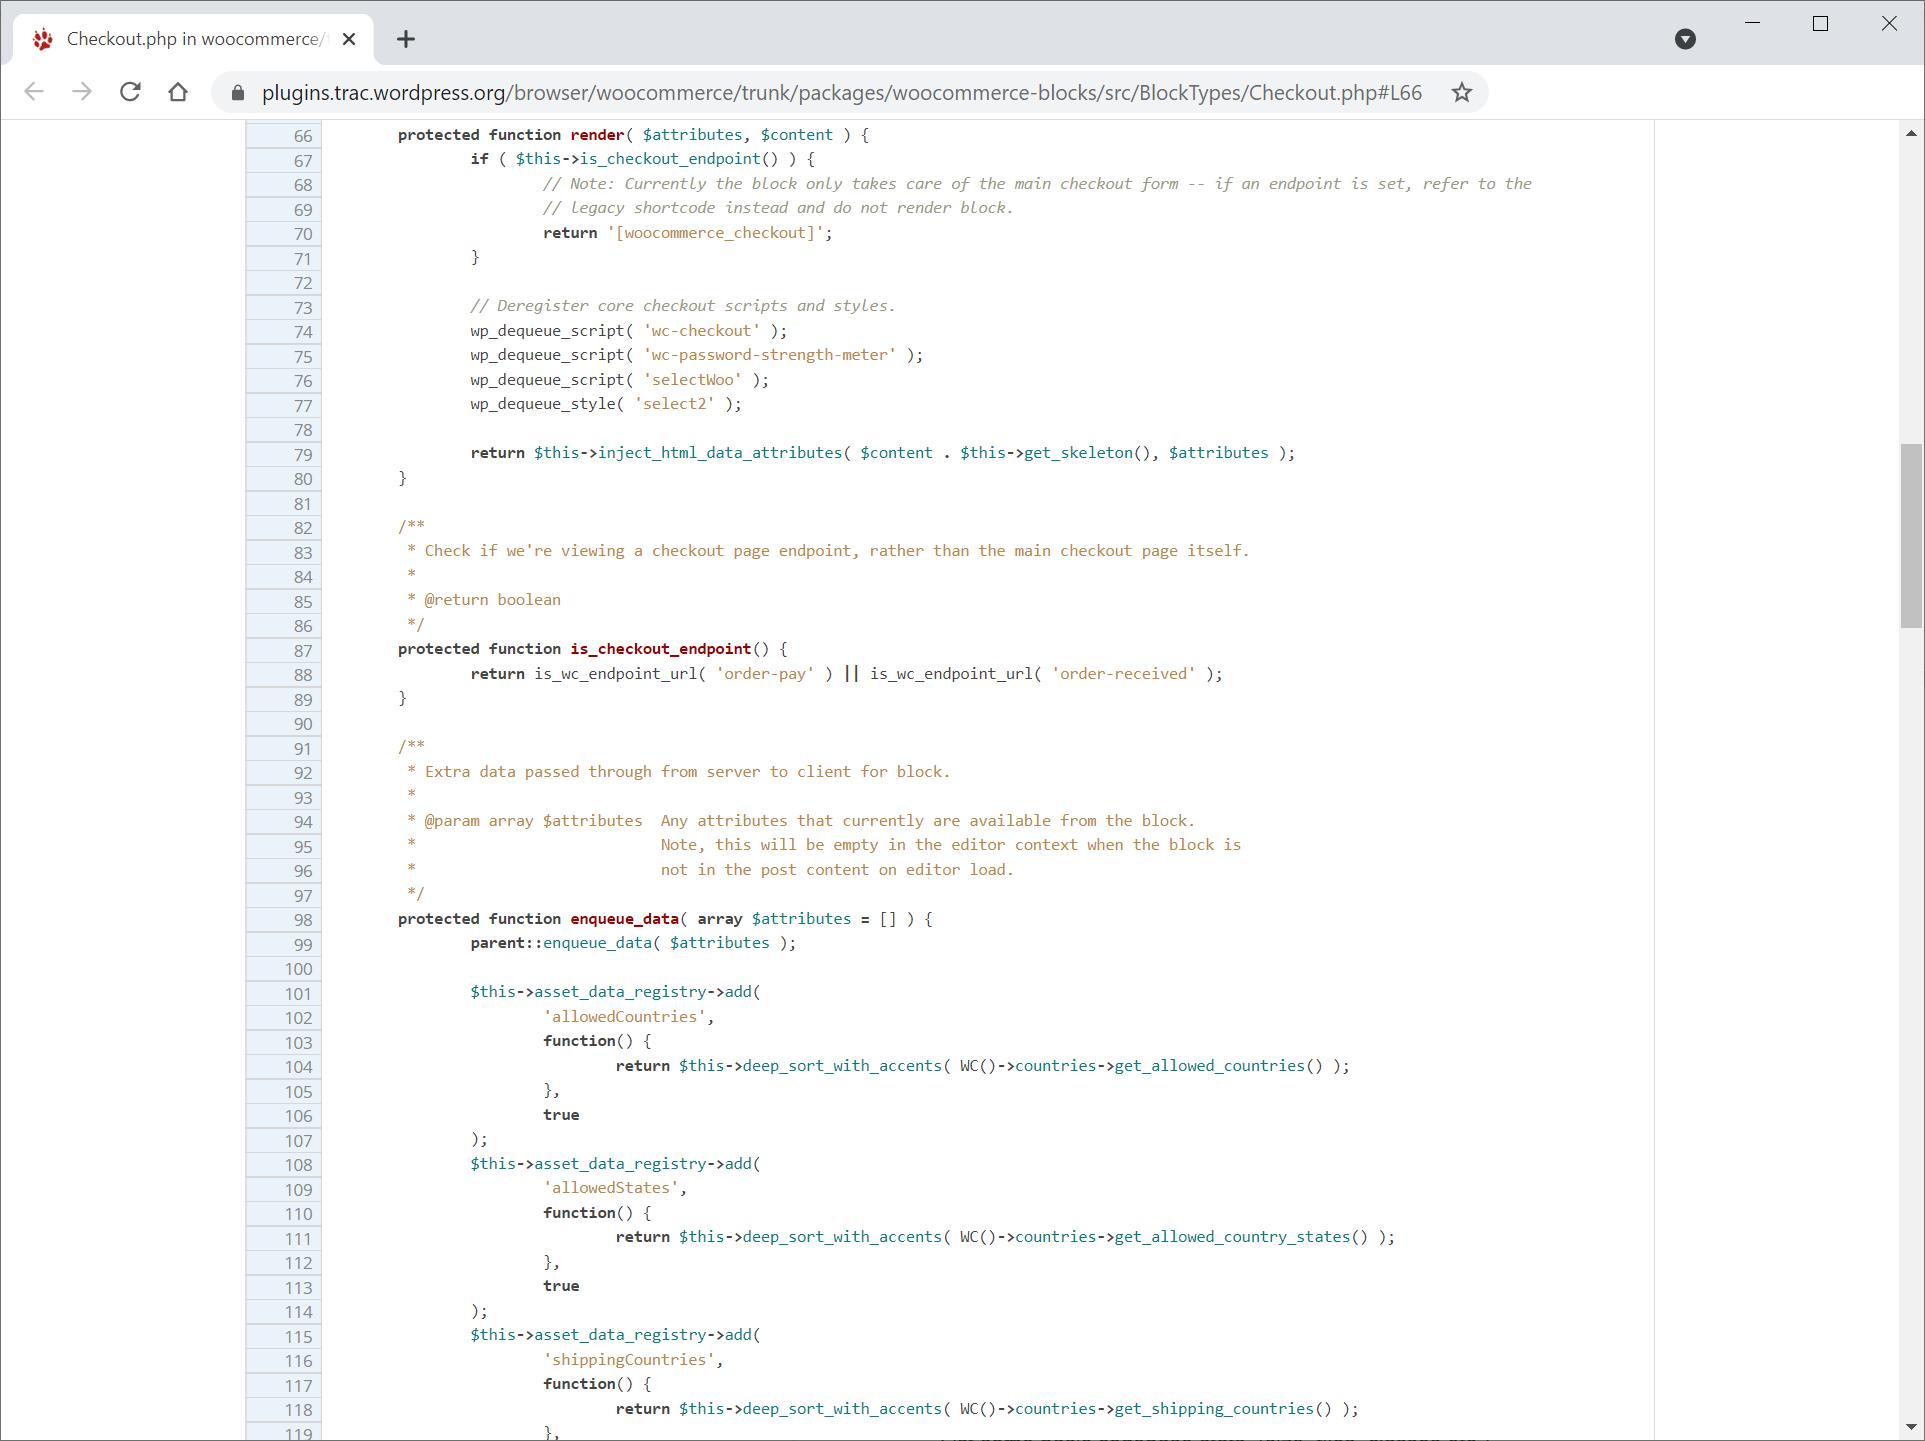 WooCommerce: Exploring the Codebase